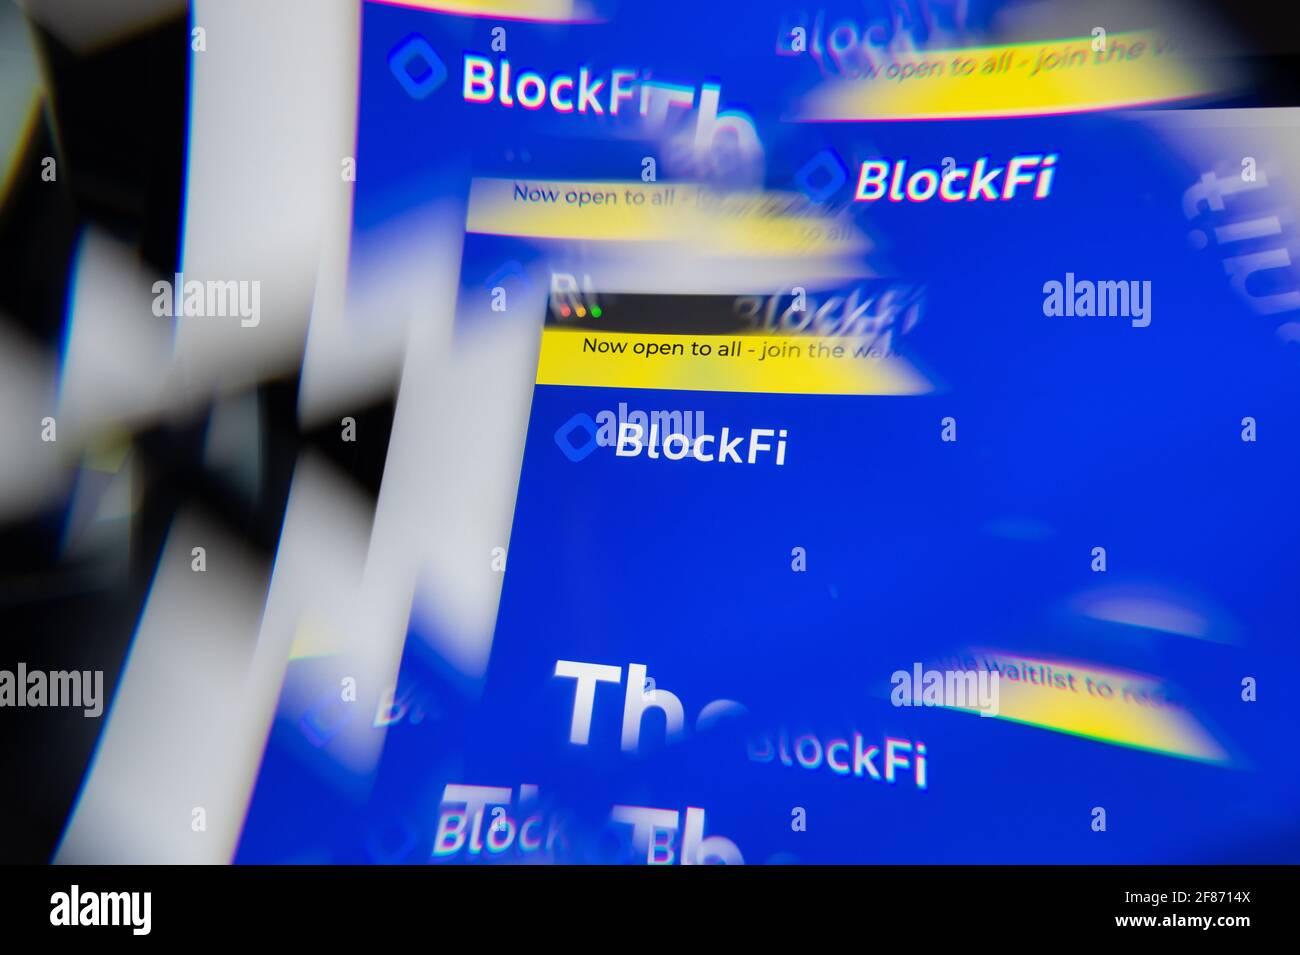 Milan, Italy - APRIL 10, 2021: BlockFi logo on laptop screen seen through an optical prism. Illustrative editorial image from BlockFi website. Stock Photo